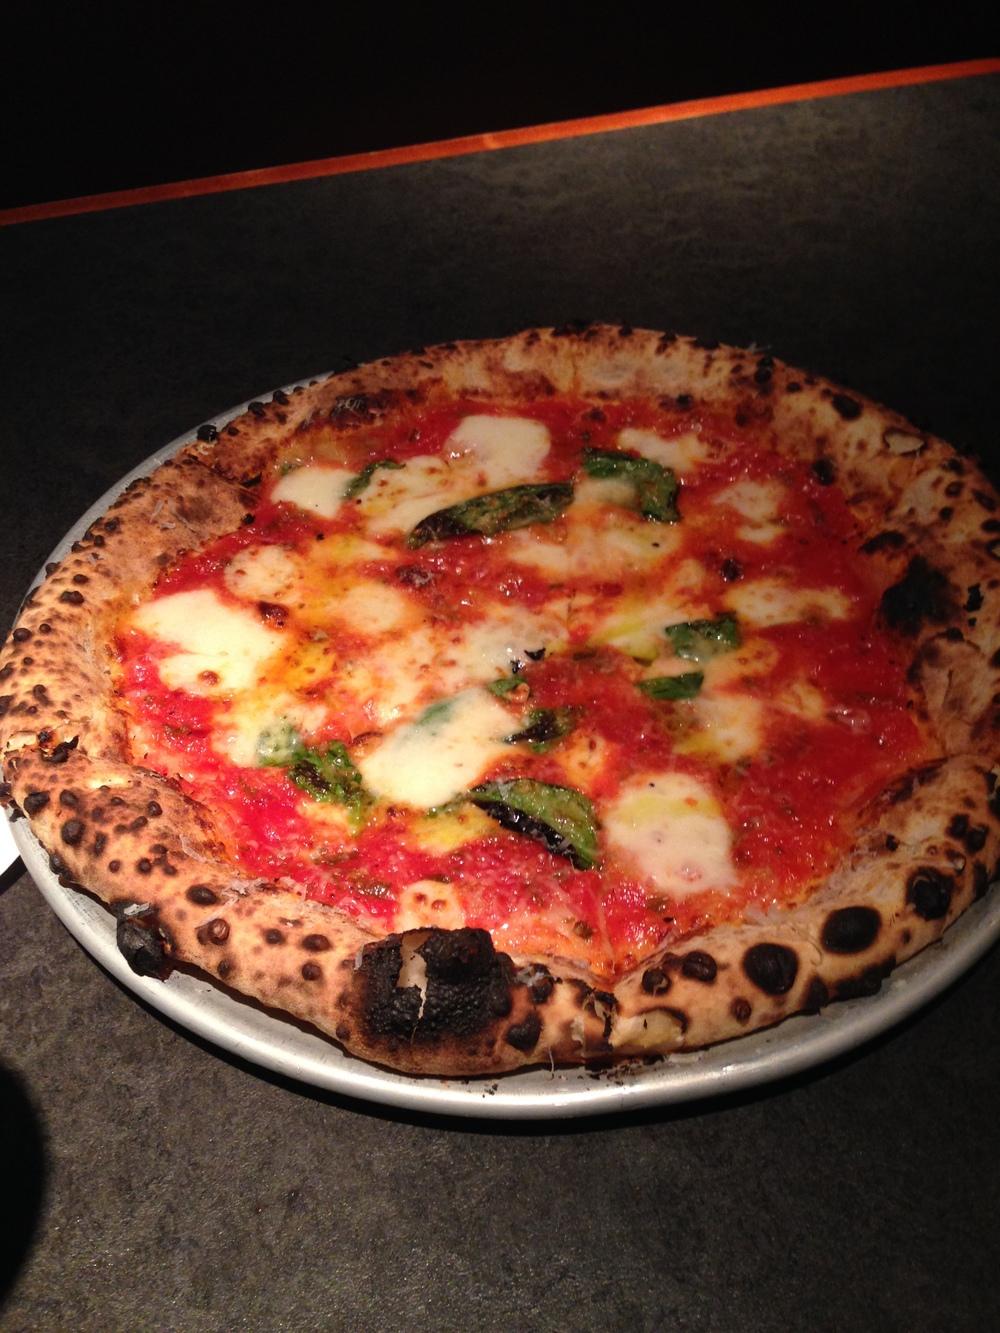 Pizzeria Stella - Magherita